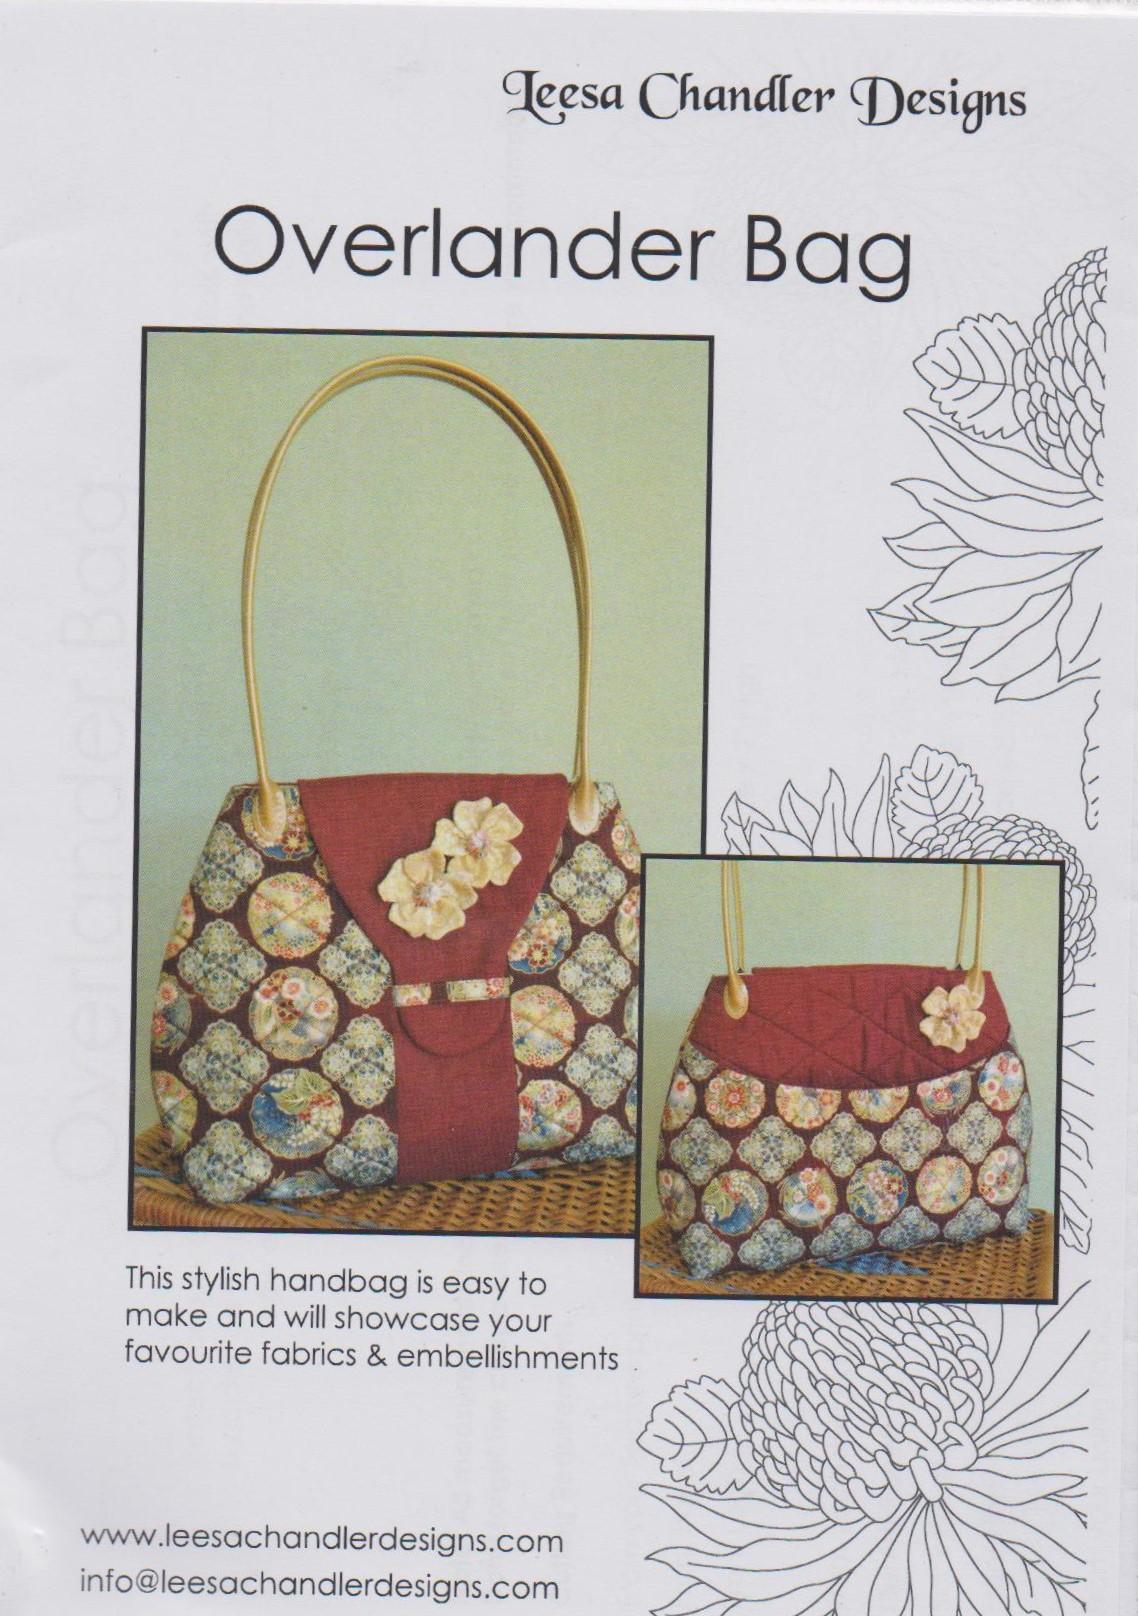 Overlander Bag pattern by Leesa Chandler Designs 116RK